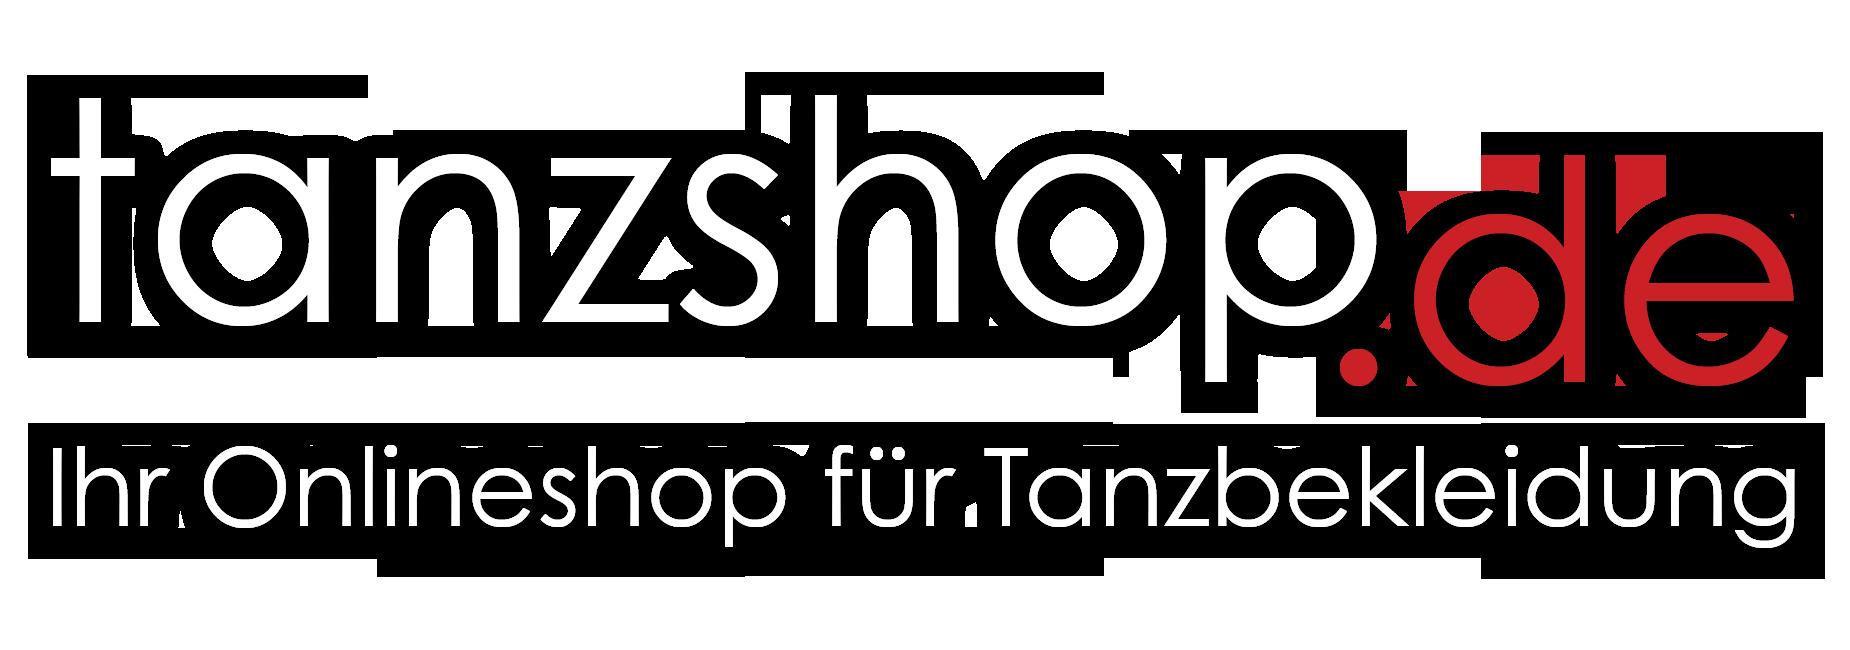 tanzshop_de